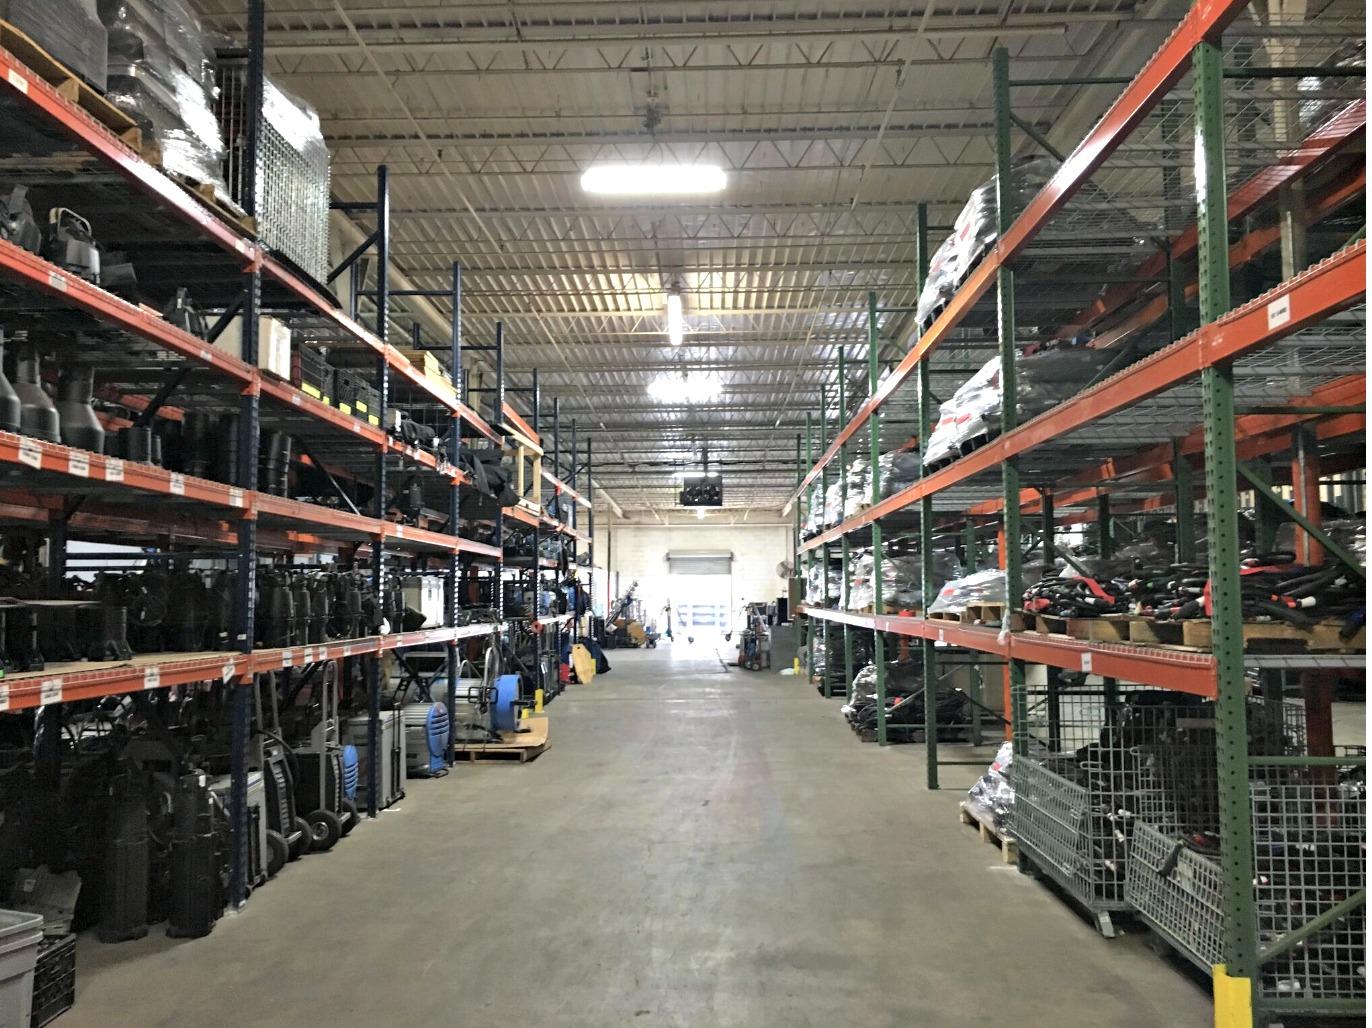 EUE/Screen Gems Studios Atlanta- Lighting and Grip Shelves